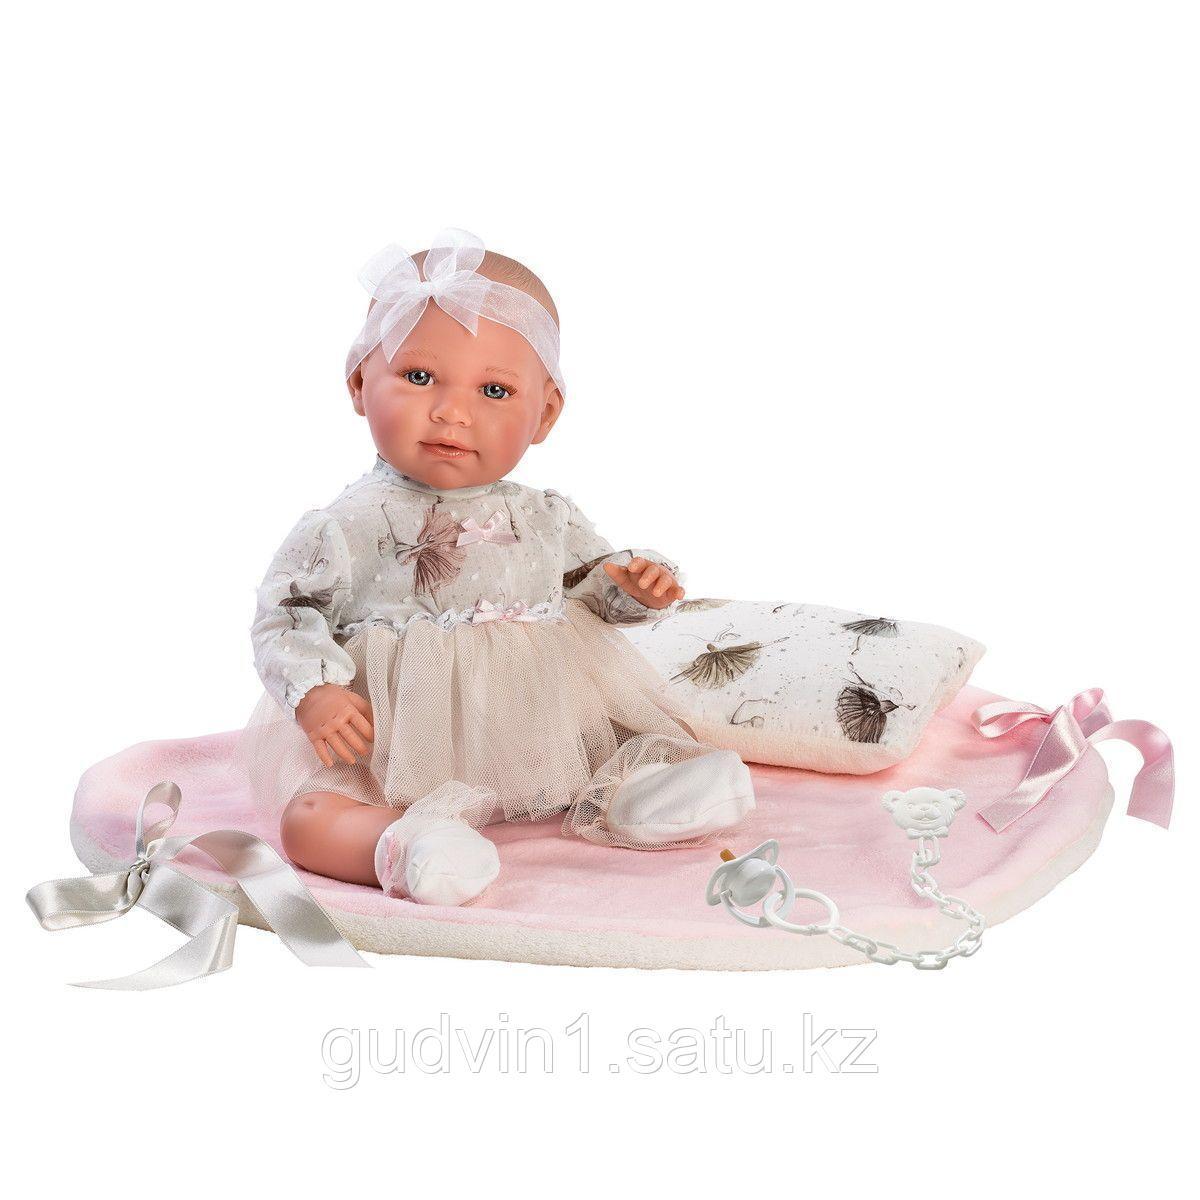 LLORENS: Пупс Малышка-балерина 40см, с одеялом и подушкой 1102635